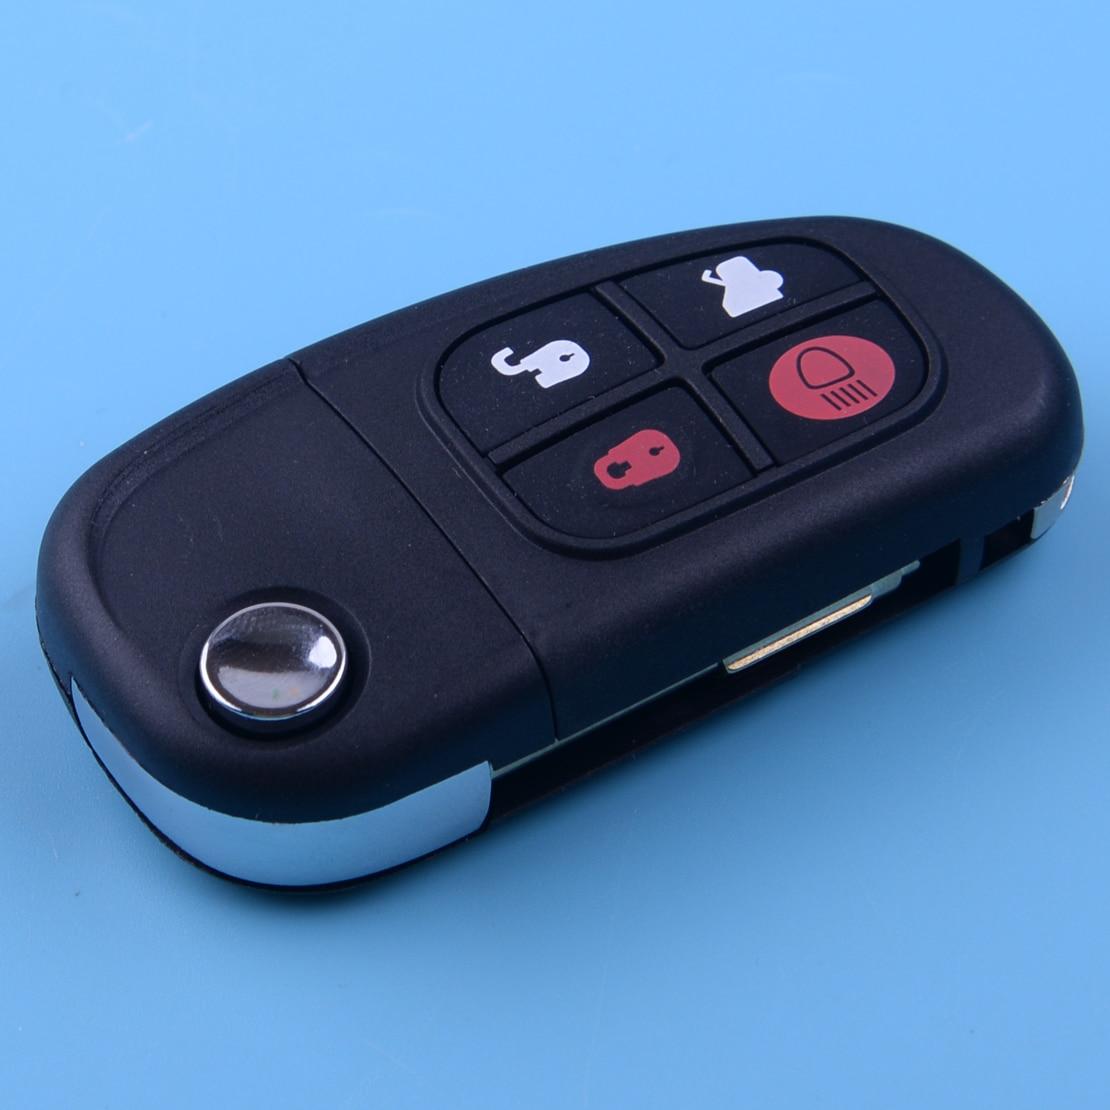 DWCX Keyless Entry Remote Key Fob Flip Uncut Fit for Jaguar X-type S-type XJ8 2001 2002 2003 2004 2005 2006 2007 2008